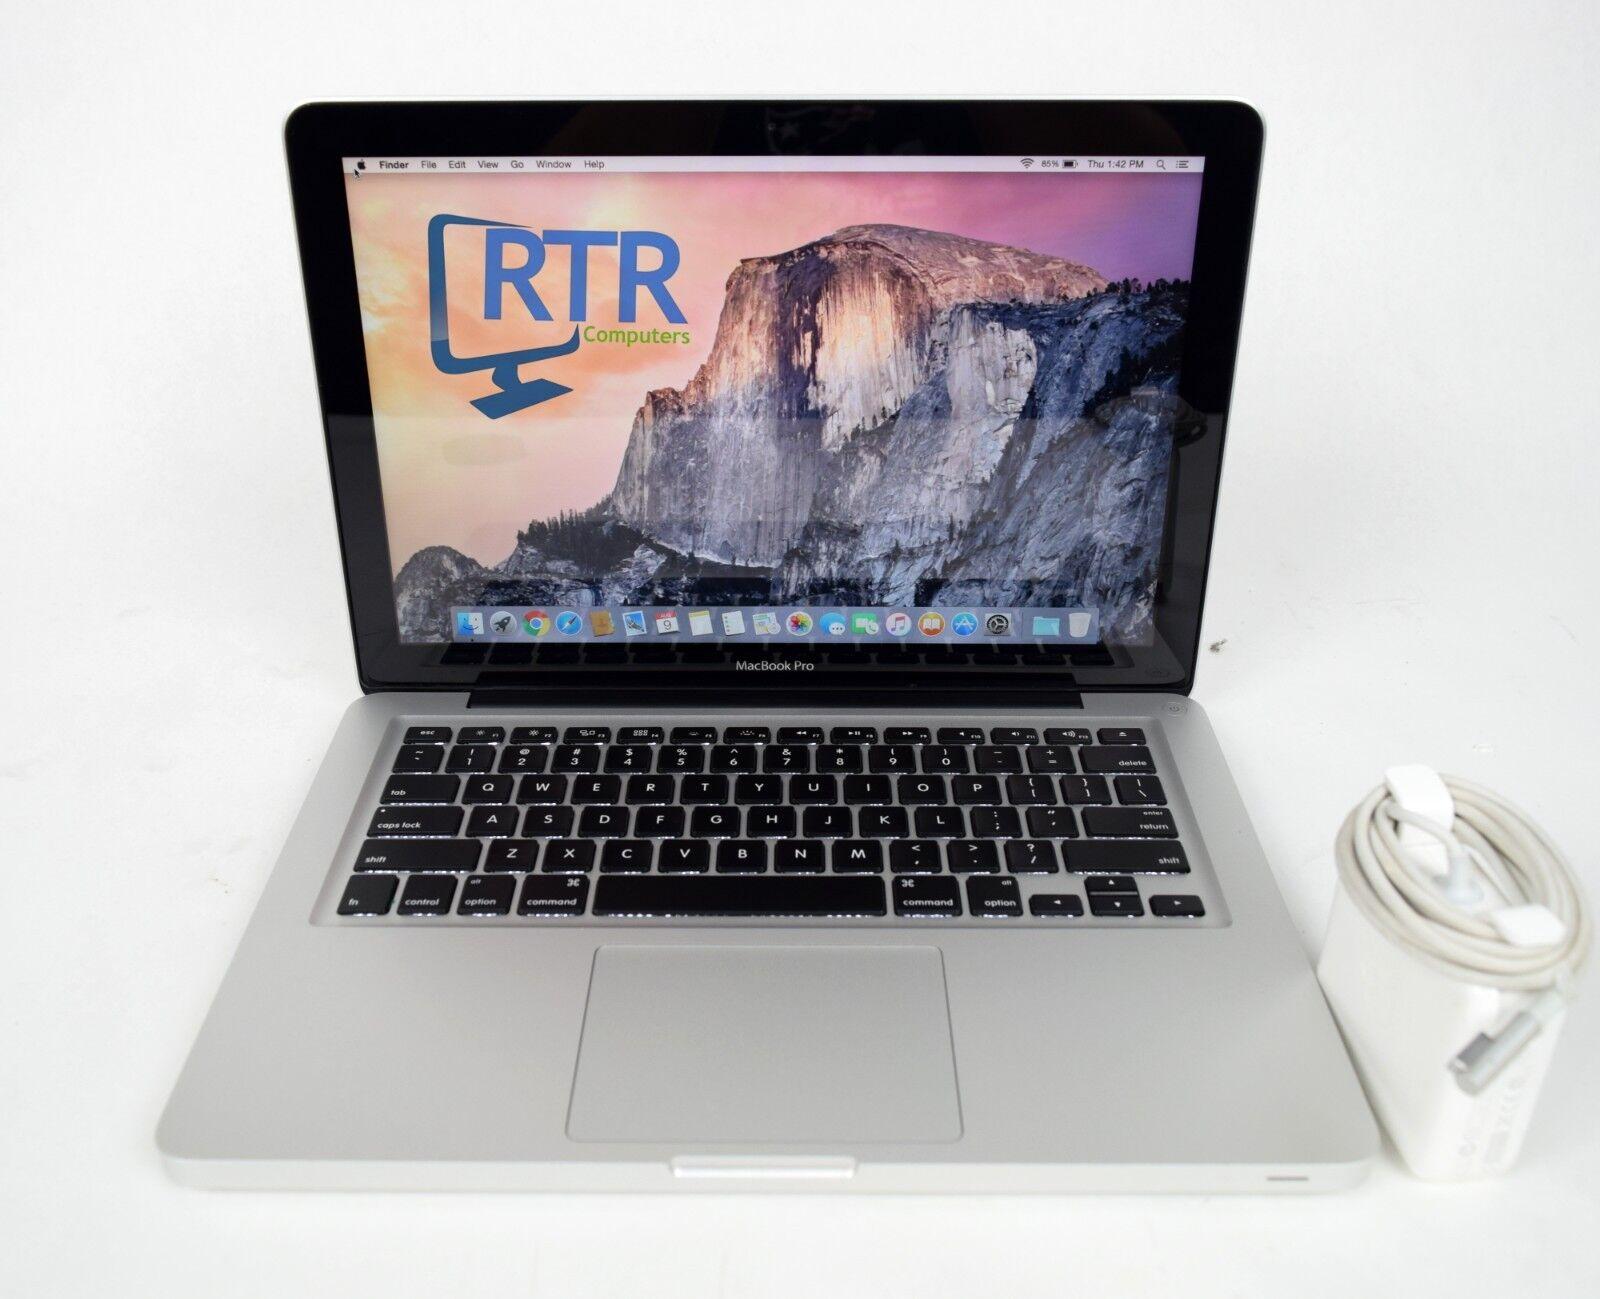 "Apple Macbook Pro 2012 13.3"" LCD MD101LL/A i5 2.5GHz 4/8/16GB RAM 128GB+ HDD/SSD"